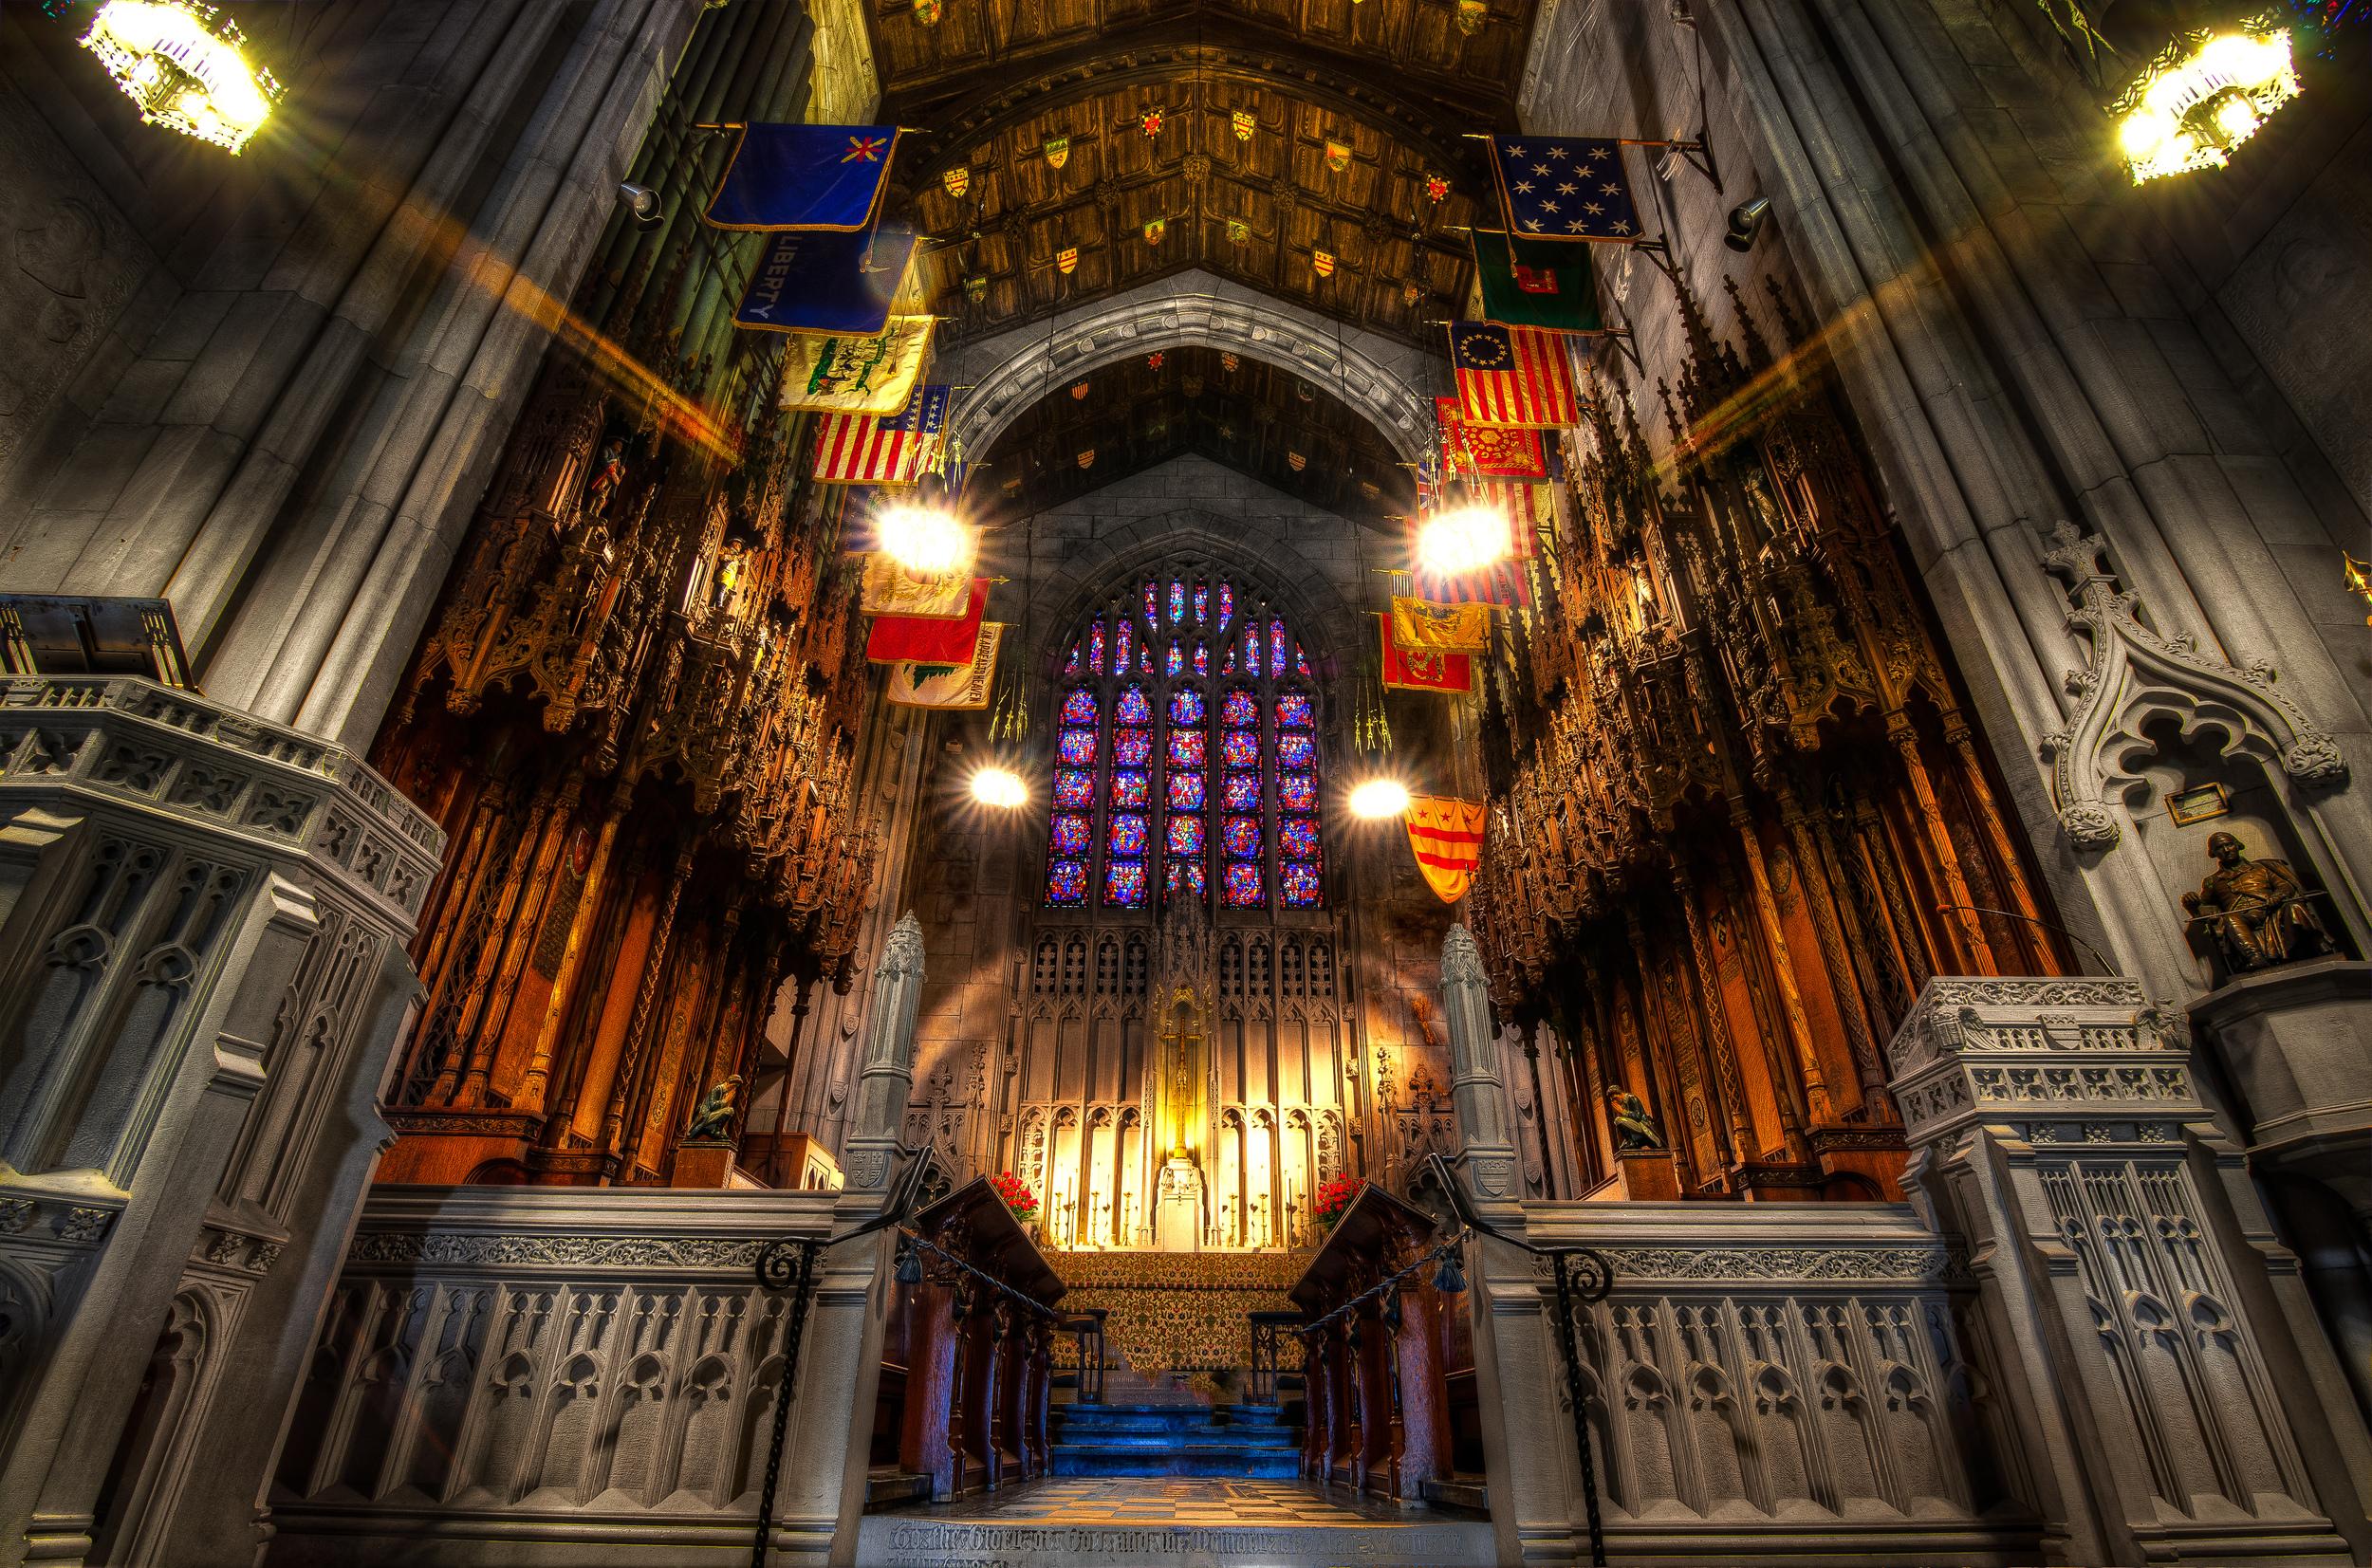 Inside the Washington Memorial Chapel